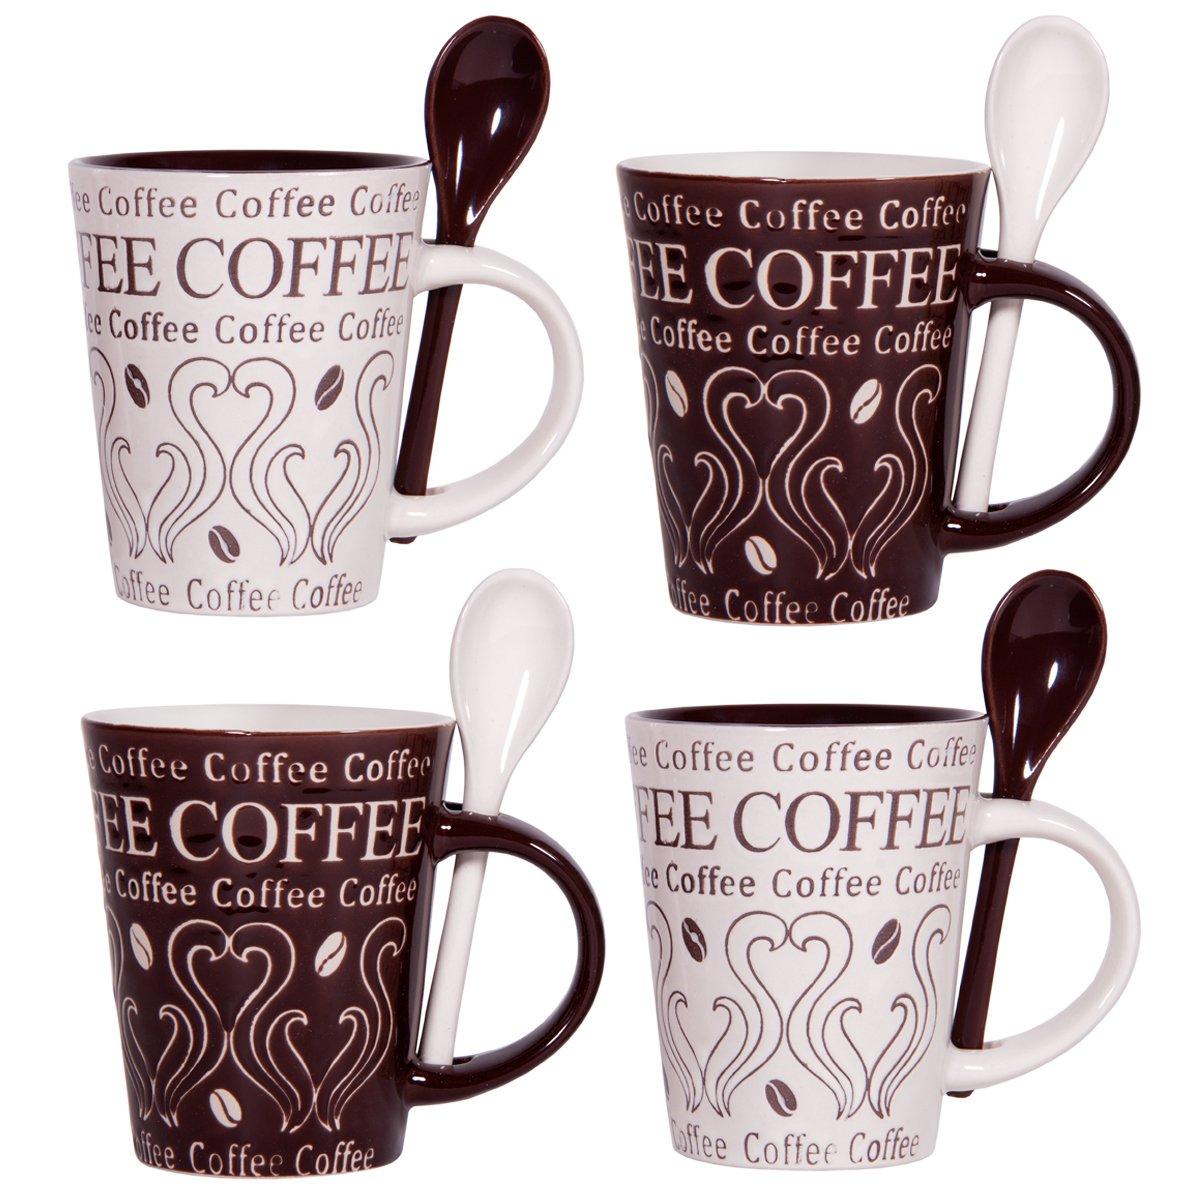 amazoncom coffee swirl  oz mug and spoon (set of ) kitchen  - amazoncom coffee swirl  oz mug and spoon (set of ) kitchen  dining